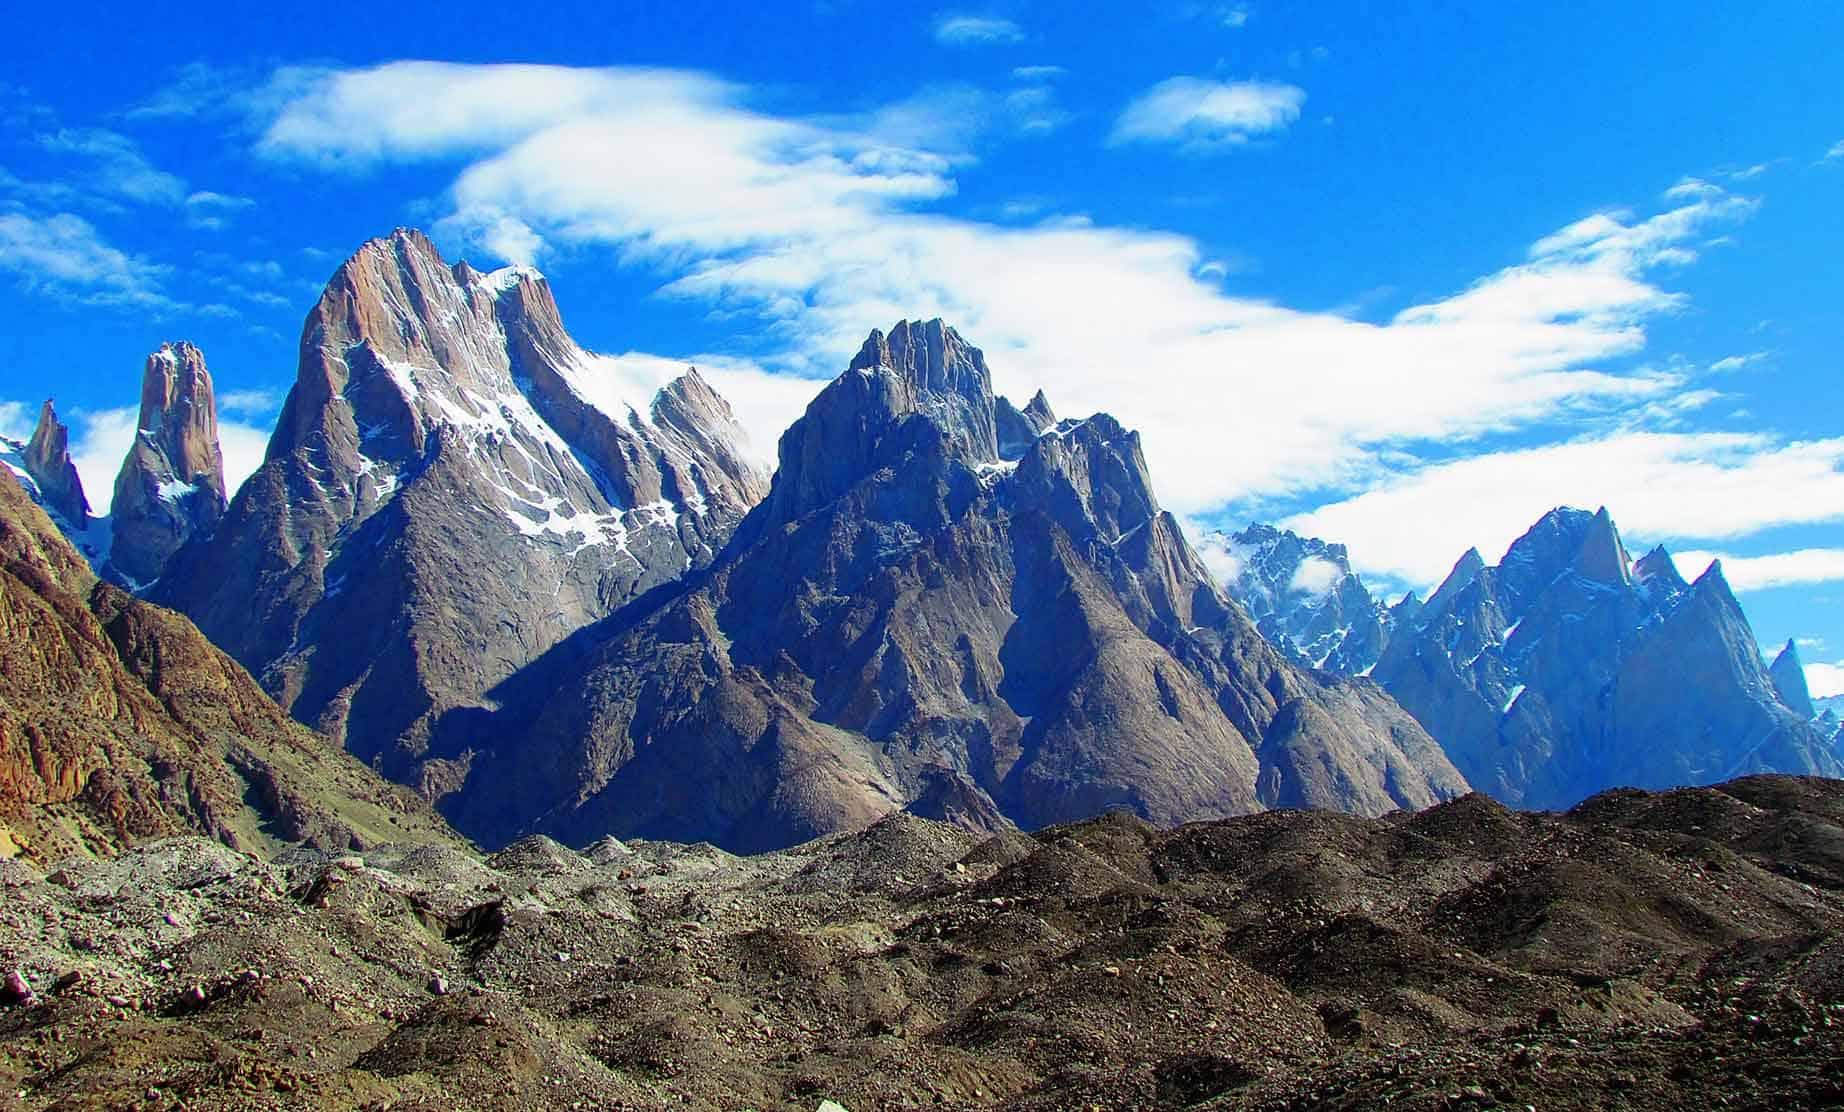 White Plains Jeep >> Trango Towers Expedition | Active Tours Pakistan